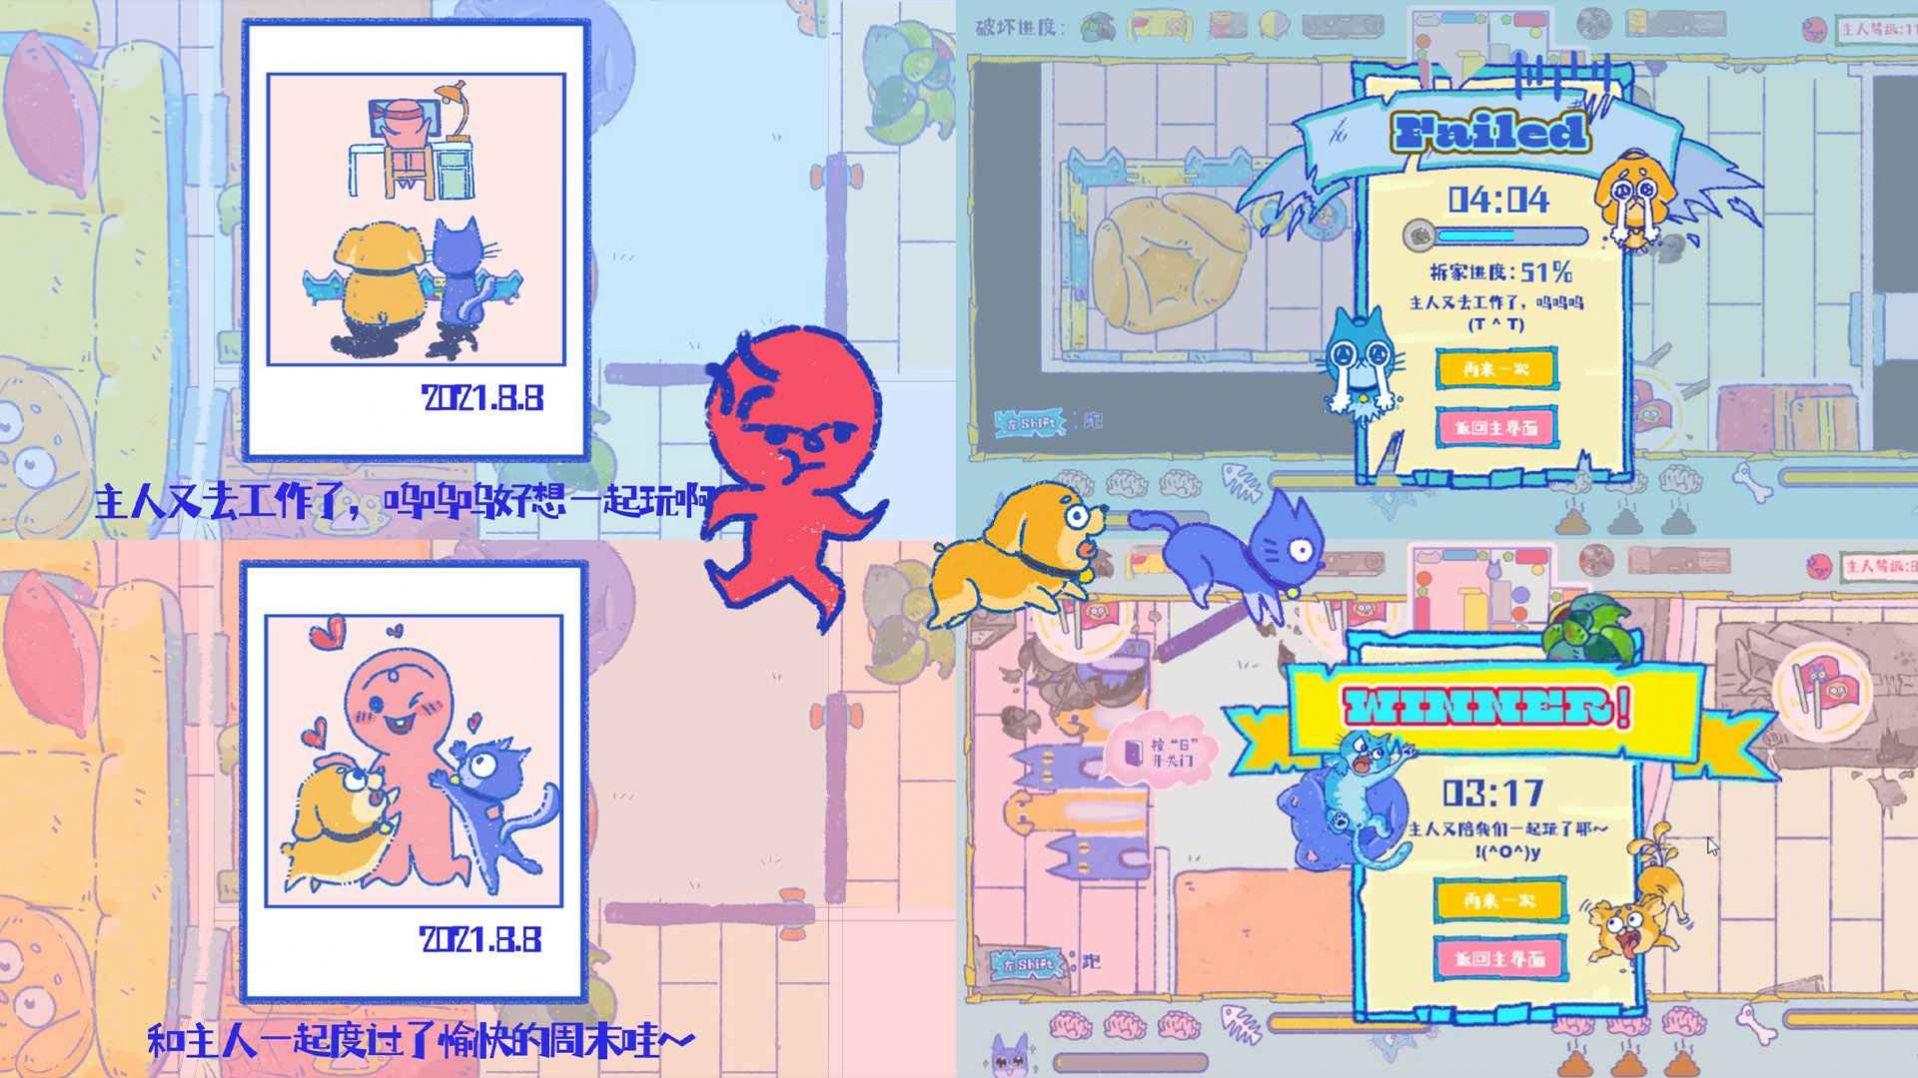 Messy Up模组游戏最新安卓版图片3